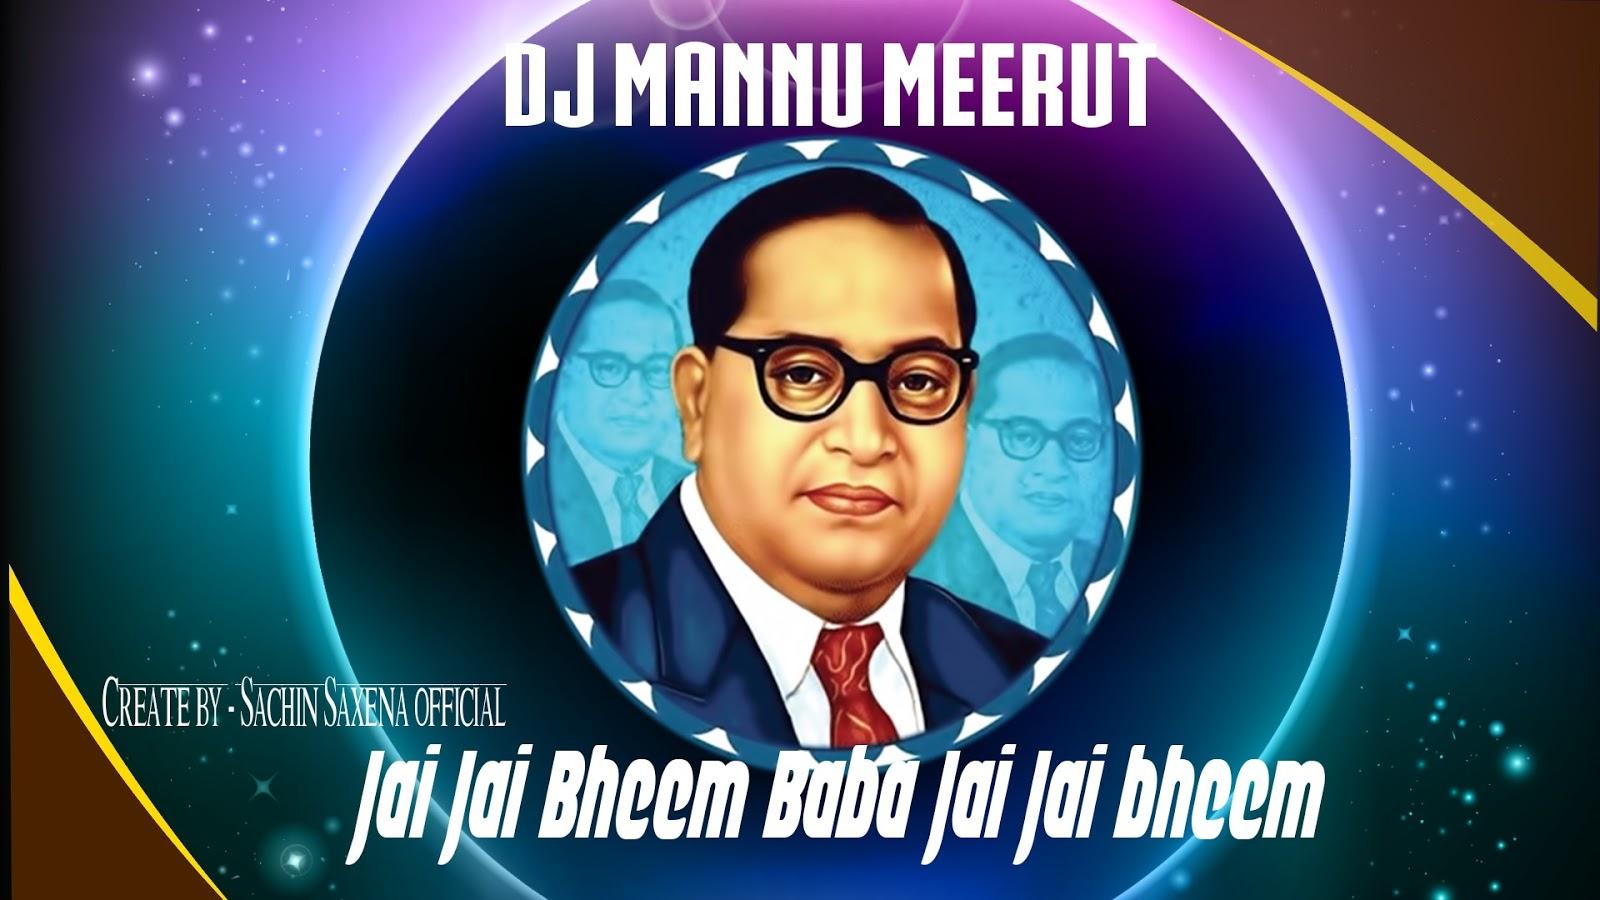 Jai bheem (Soundcheck) Remix by Dj Mannu Meerut mp3 - 3 MB ~ Sachin